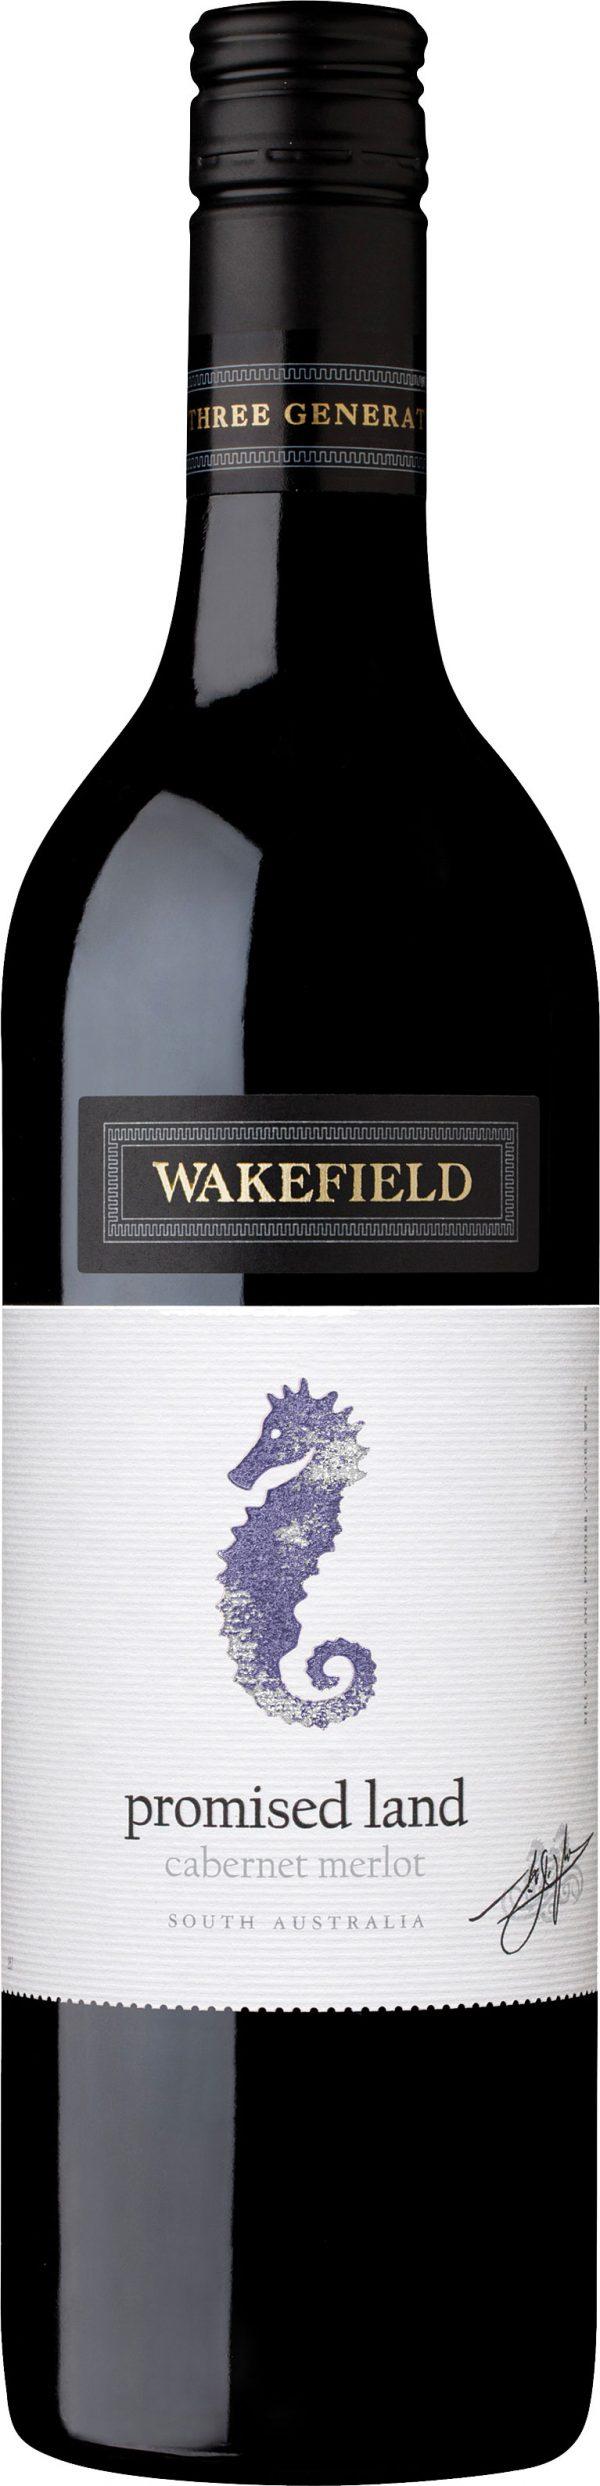 Wakefield Wines - Promised Land Cabernet Merlot 2017 6x 75cl Bottles